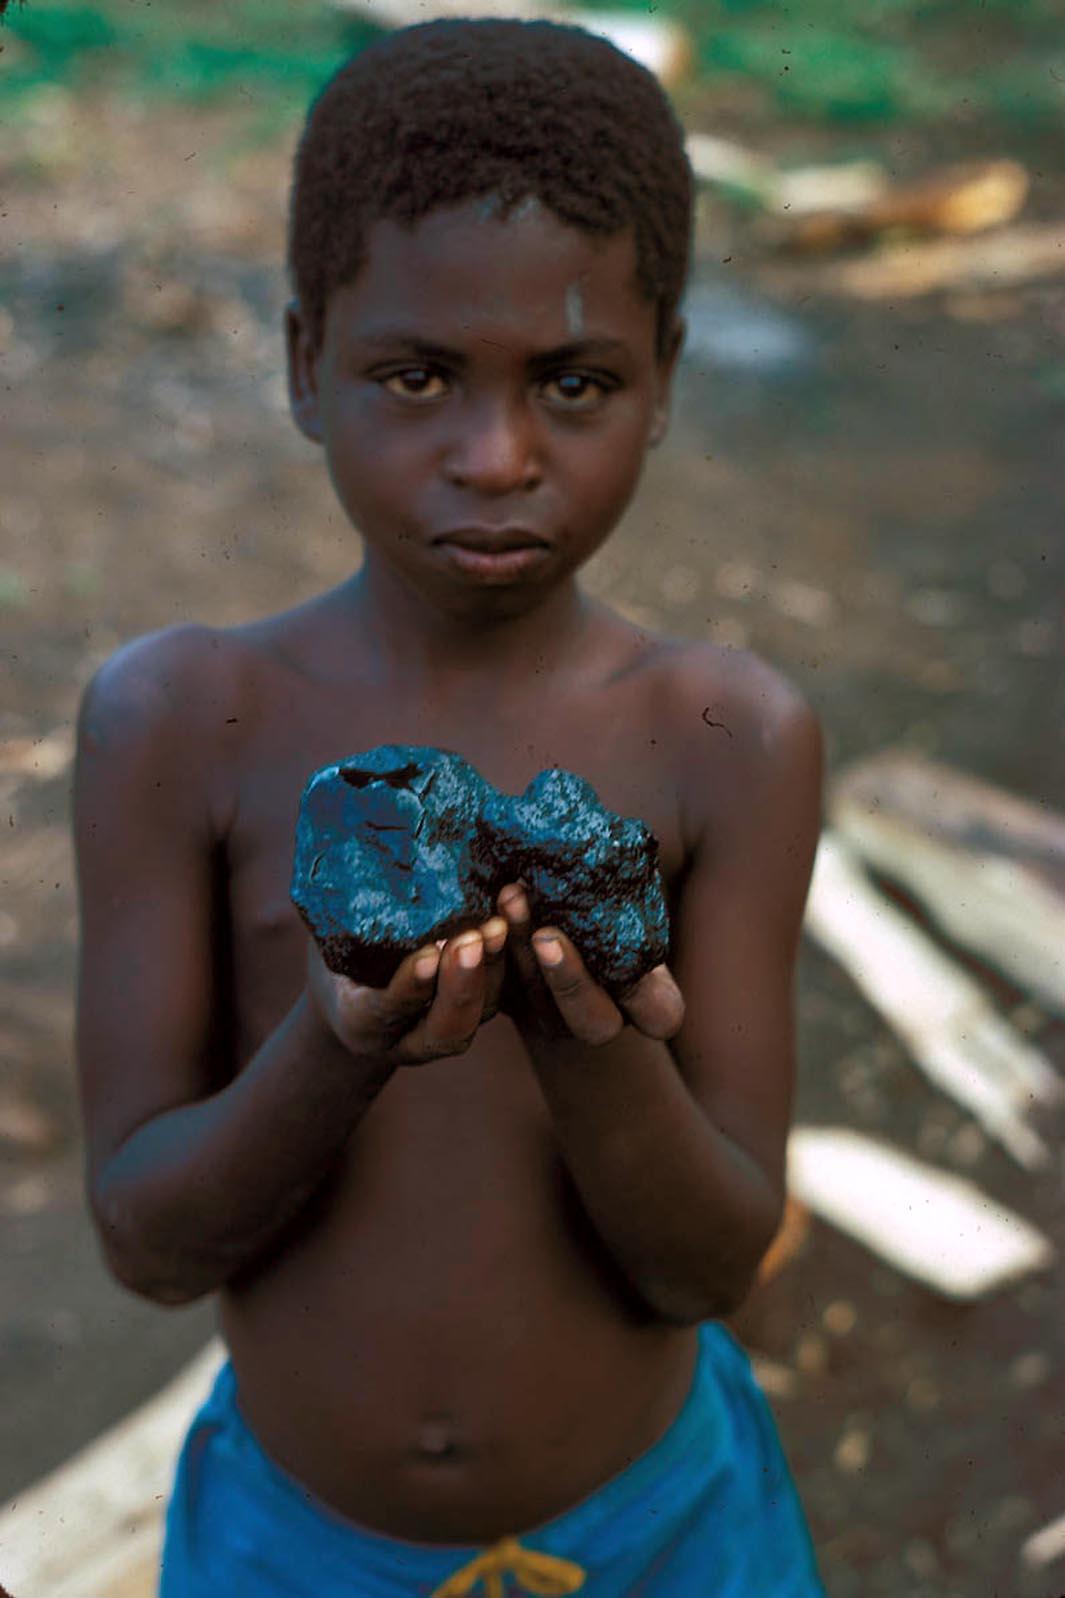 Hot west african boy 10